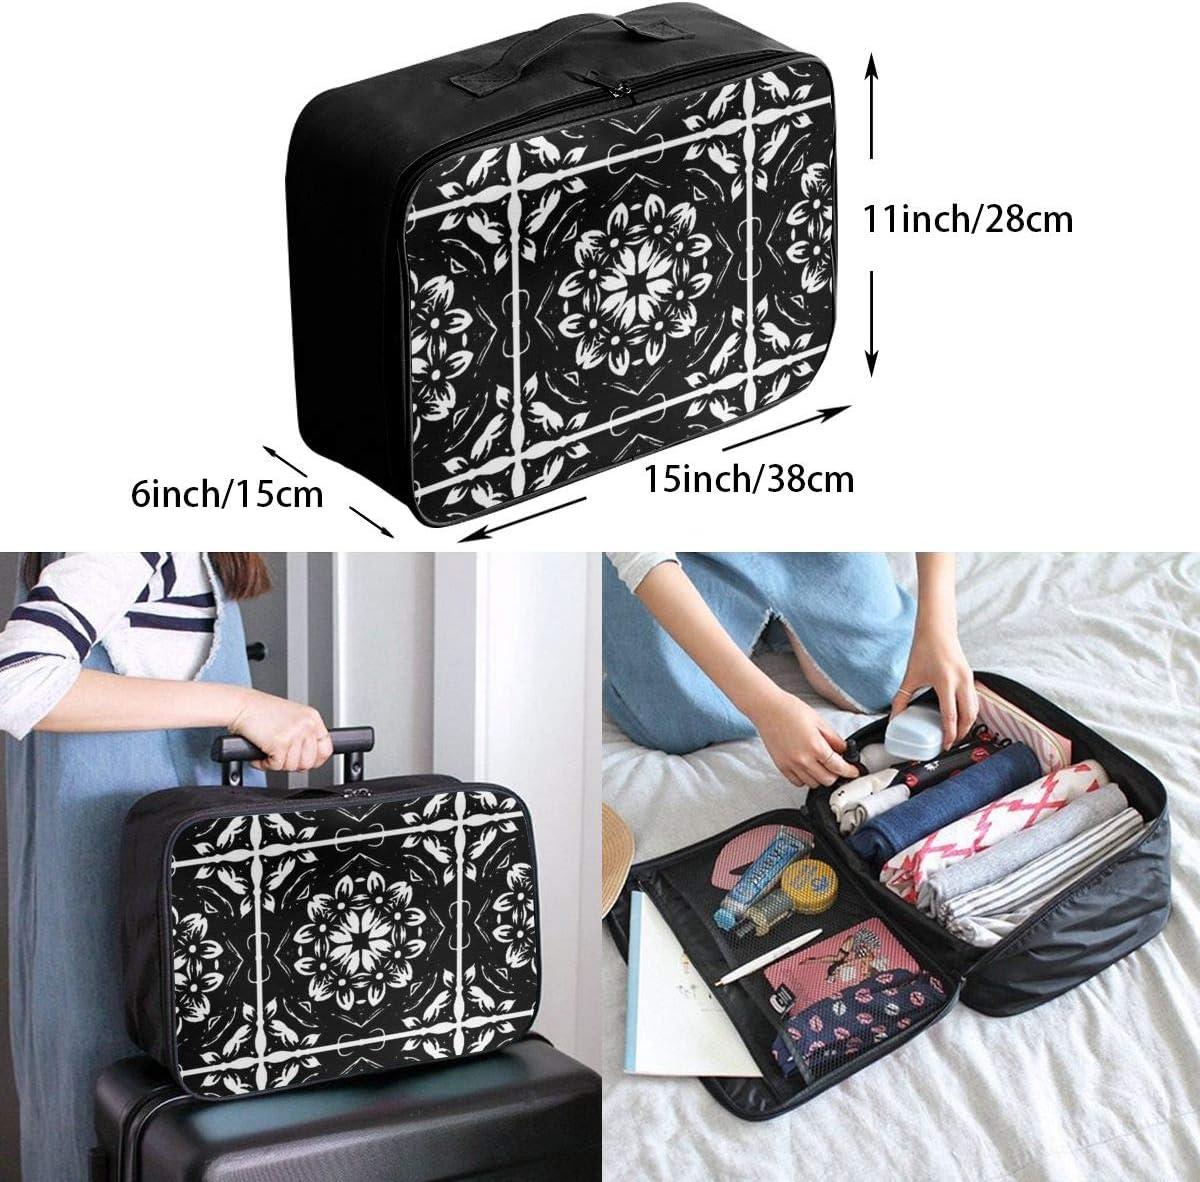 Yunshm Kaleidoscope Geometric Art Personalized Trolley Handbag Waterproof Unisex Large Capacity For Business Travel Storage